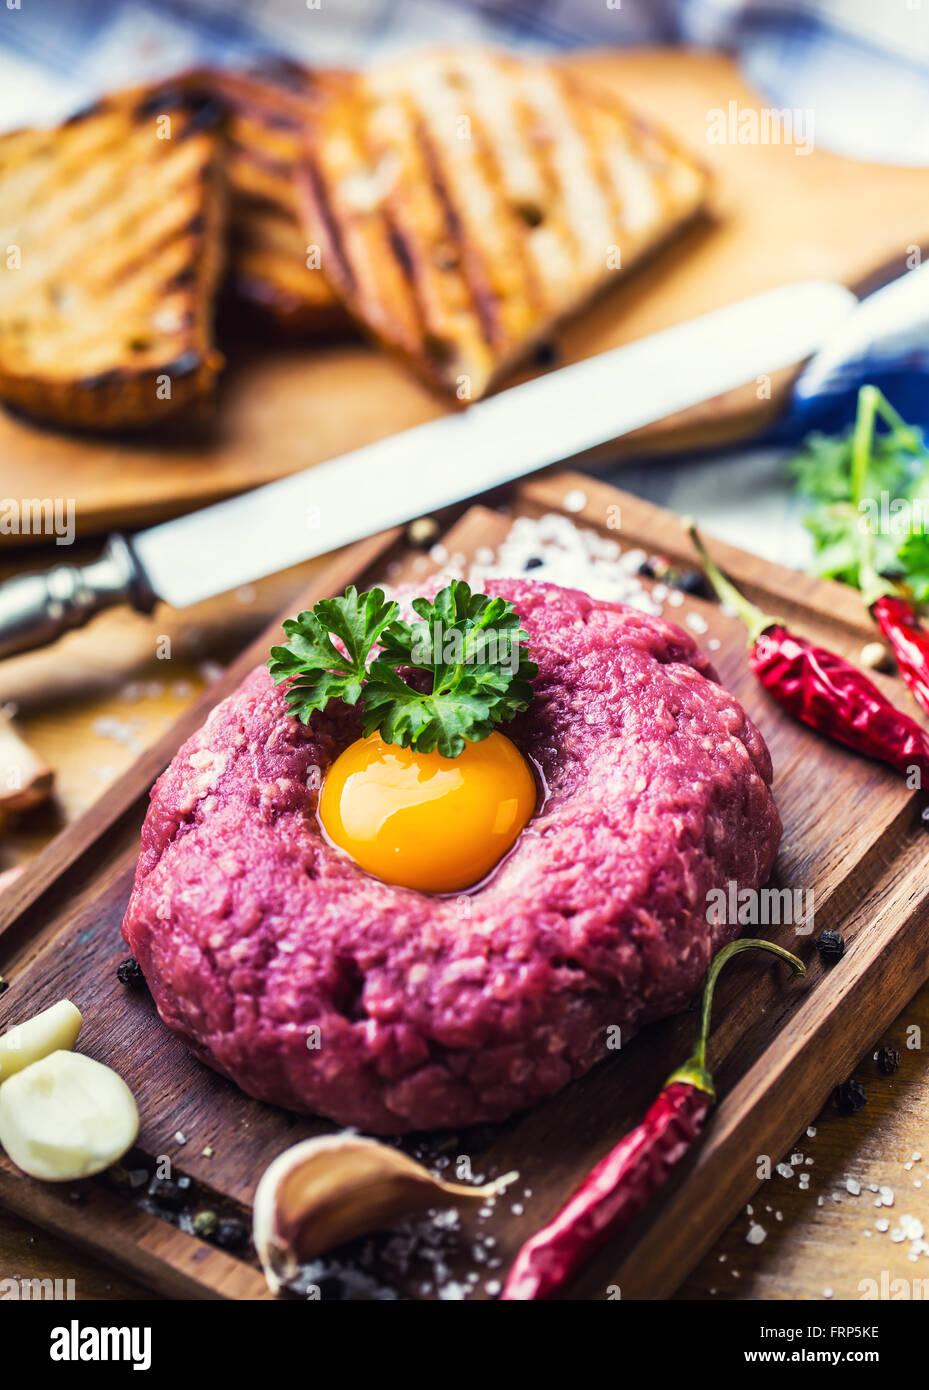 Carne cruda .sabrosa carne tártara. Carne tártara clásico sobre la plancha de madera. Ingredientes: Imagen De Stock